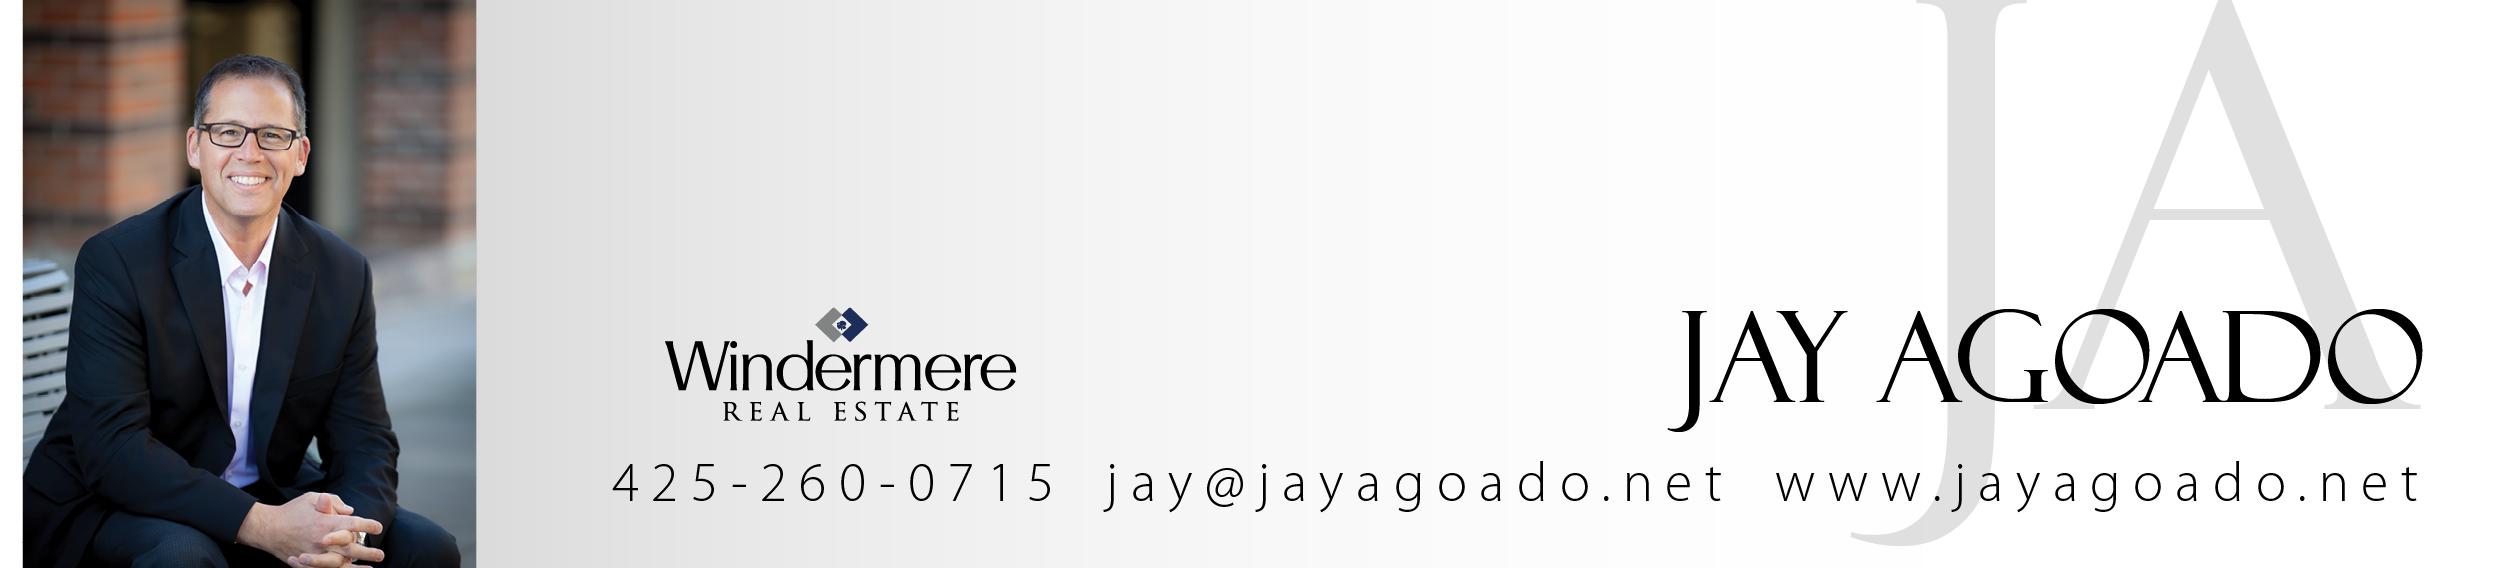 Jay Agoado, Windermere Real Estate